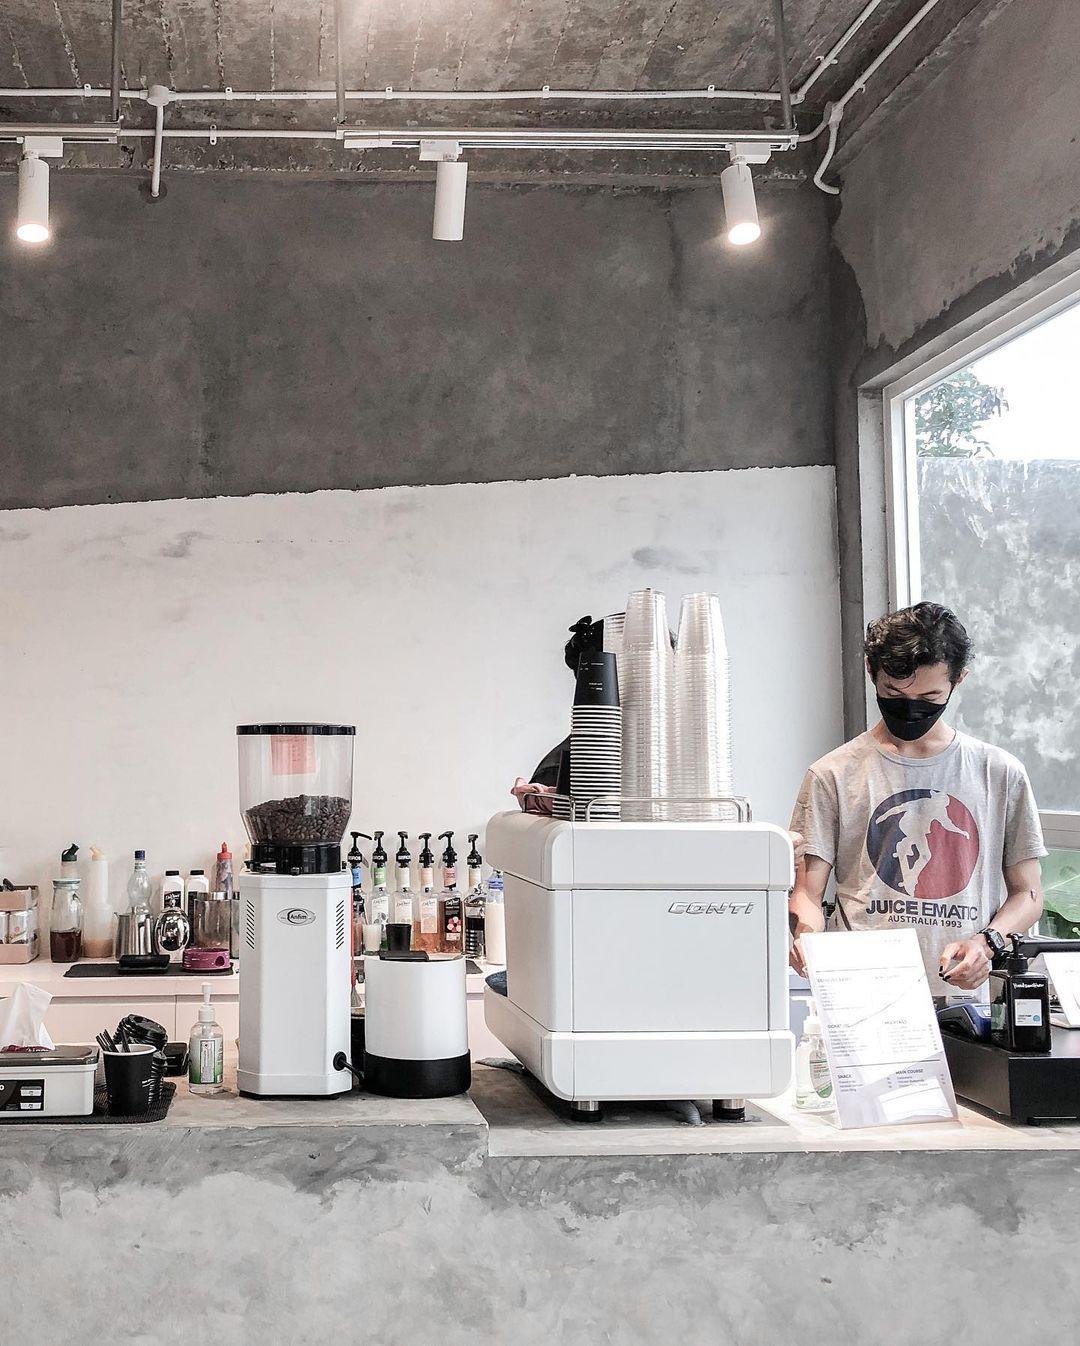 Tempat Ngopi Minimal Cafe Banjarmasin